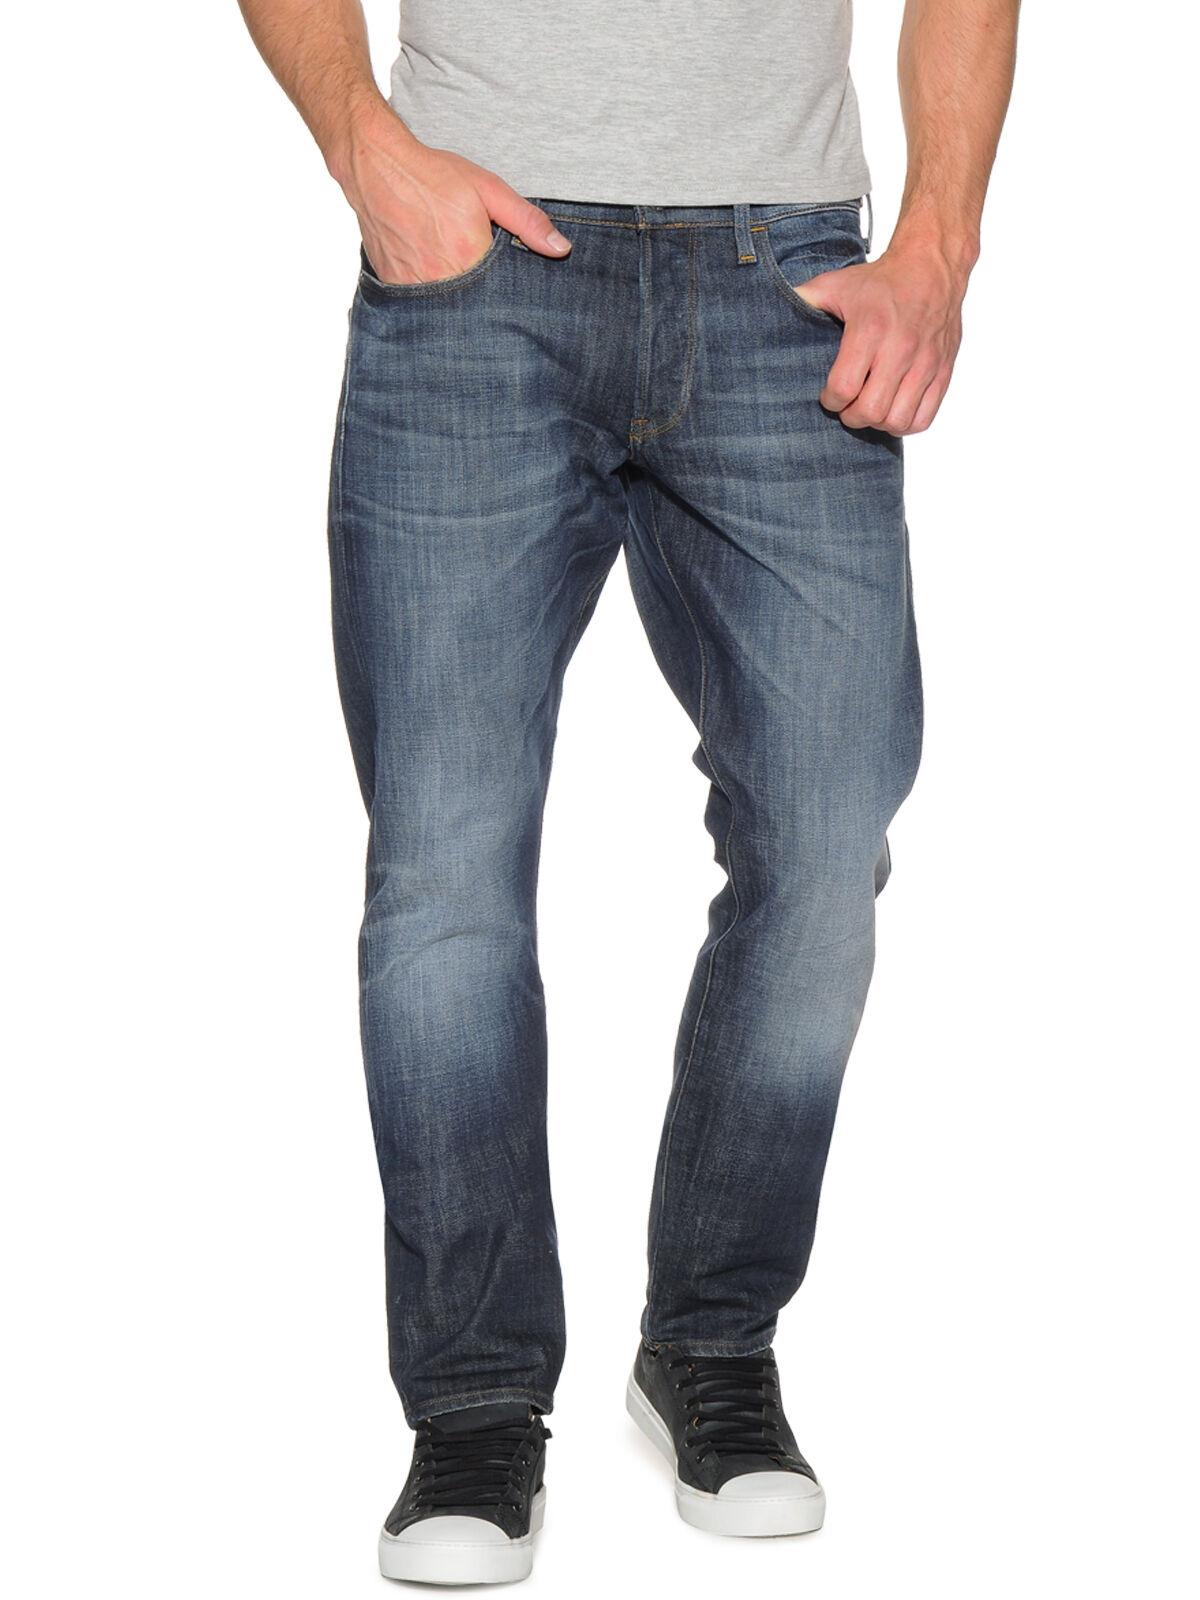 Holmer Jeans